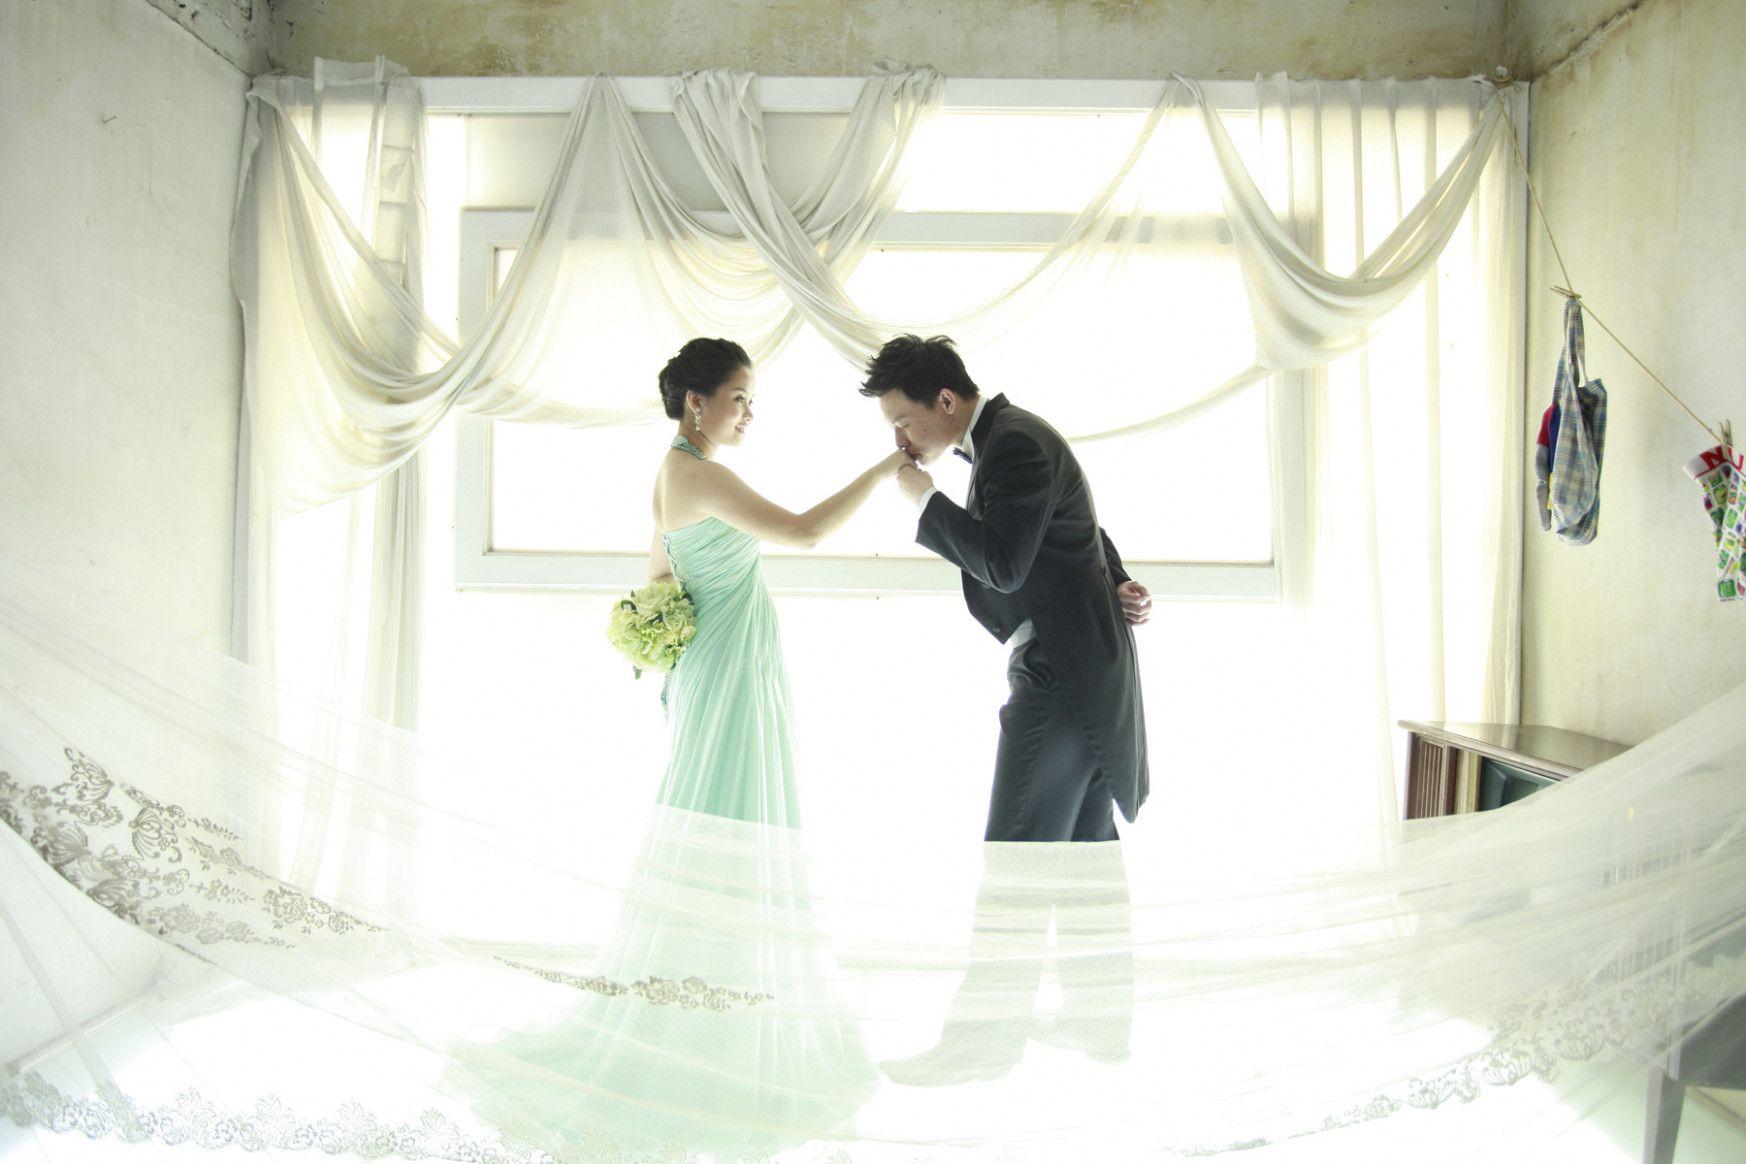 Korean wedding photography studios wedding k wallpapers